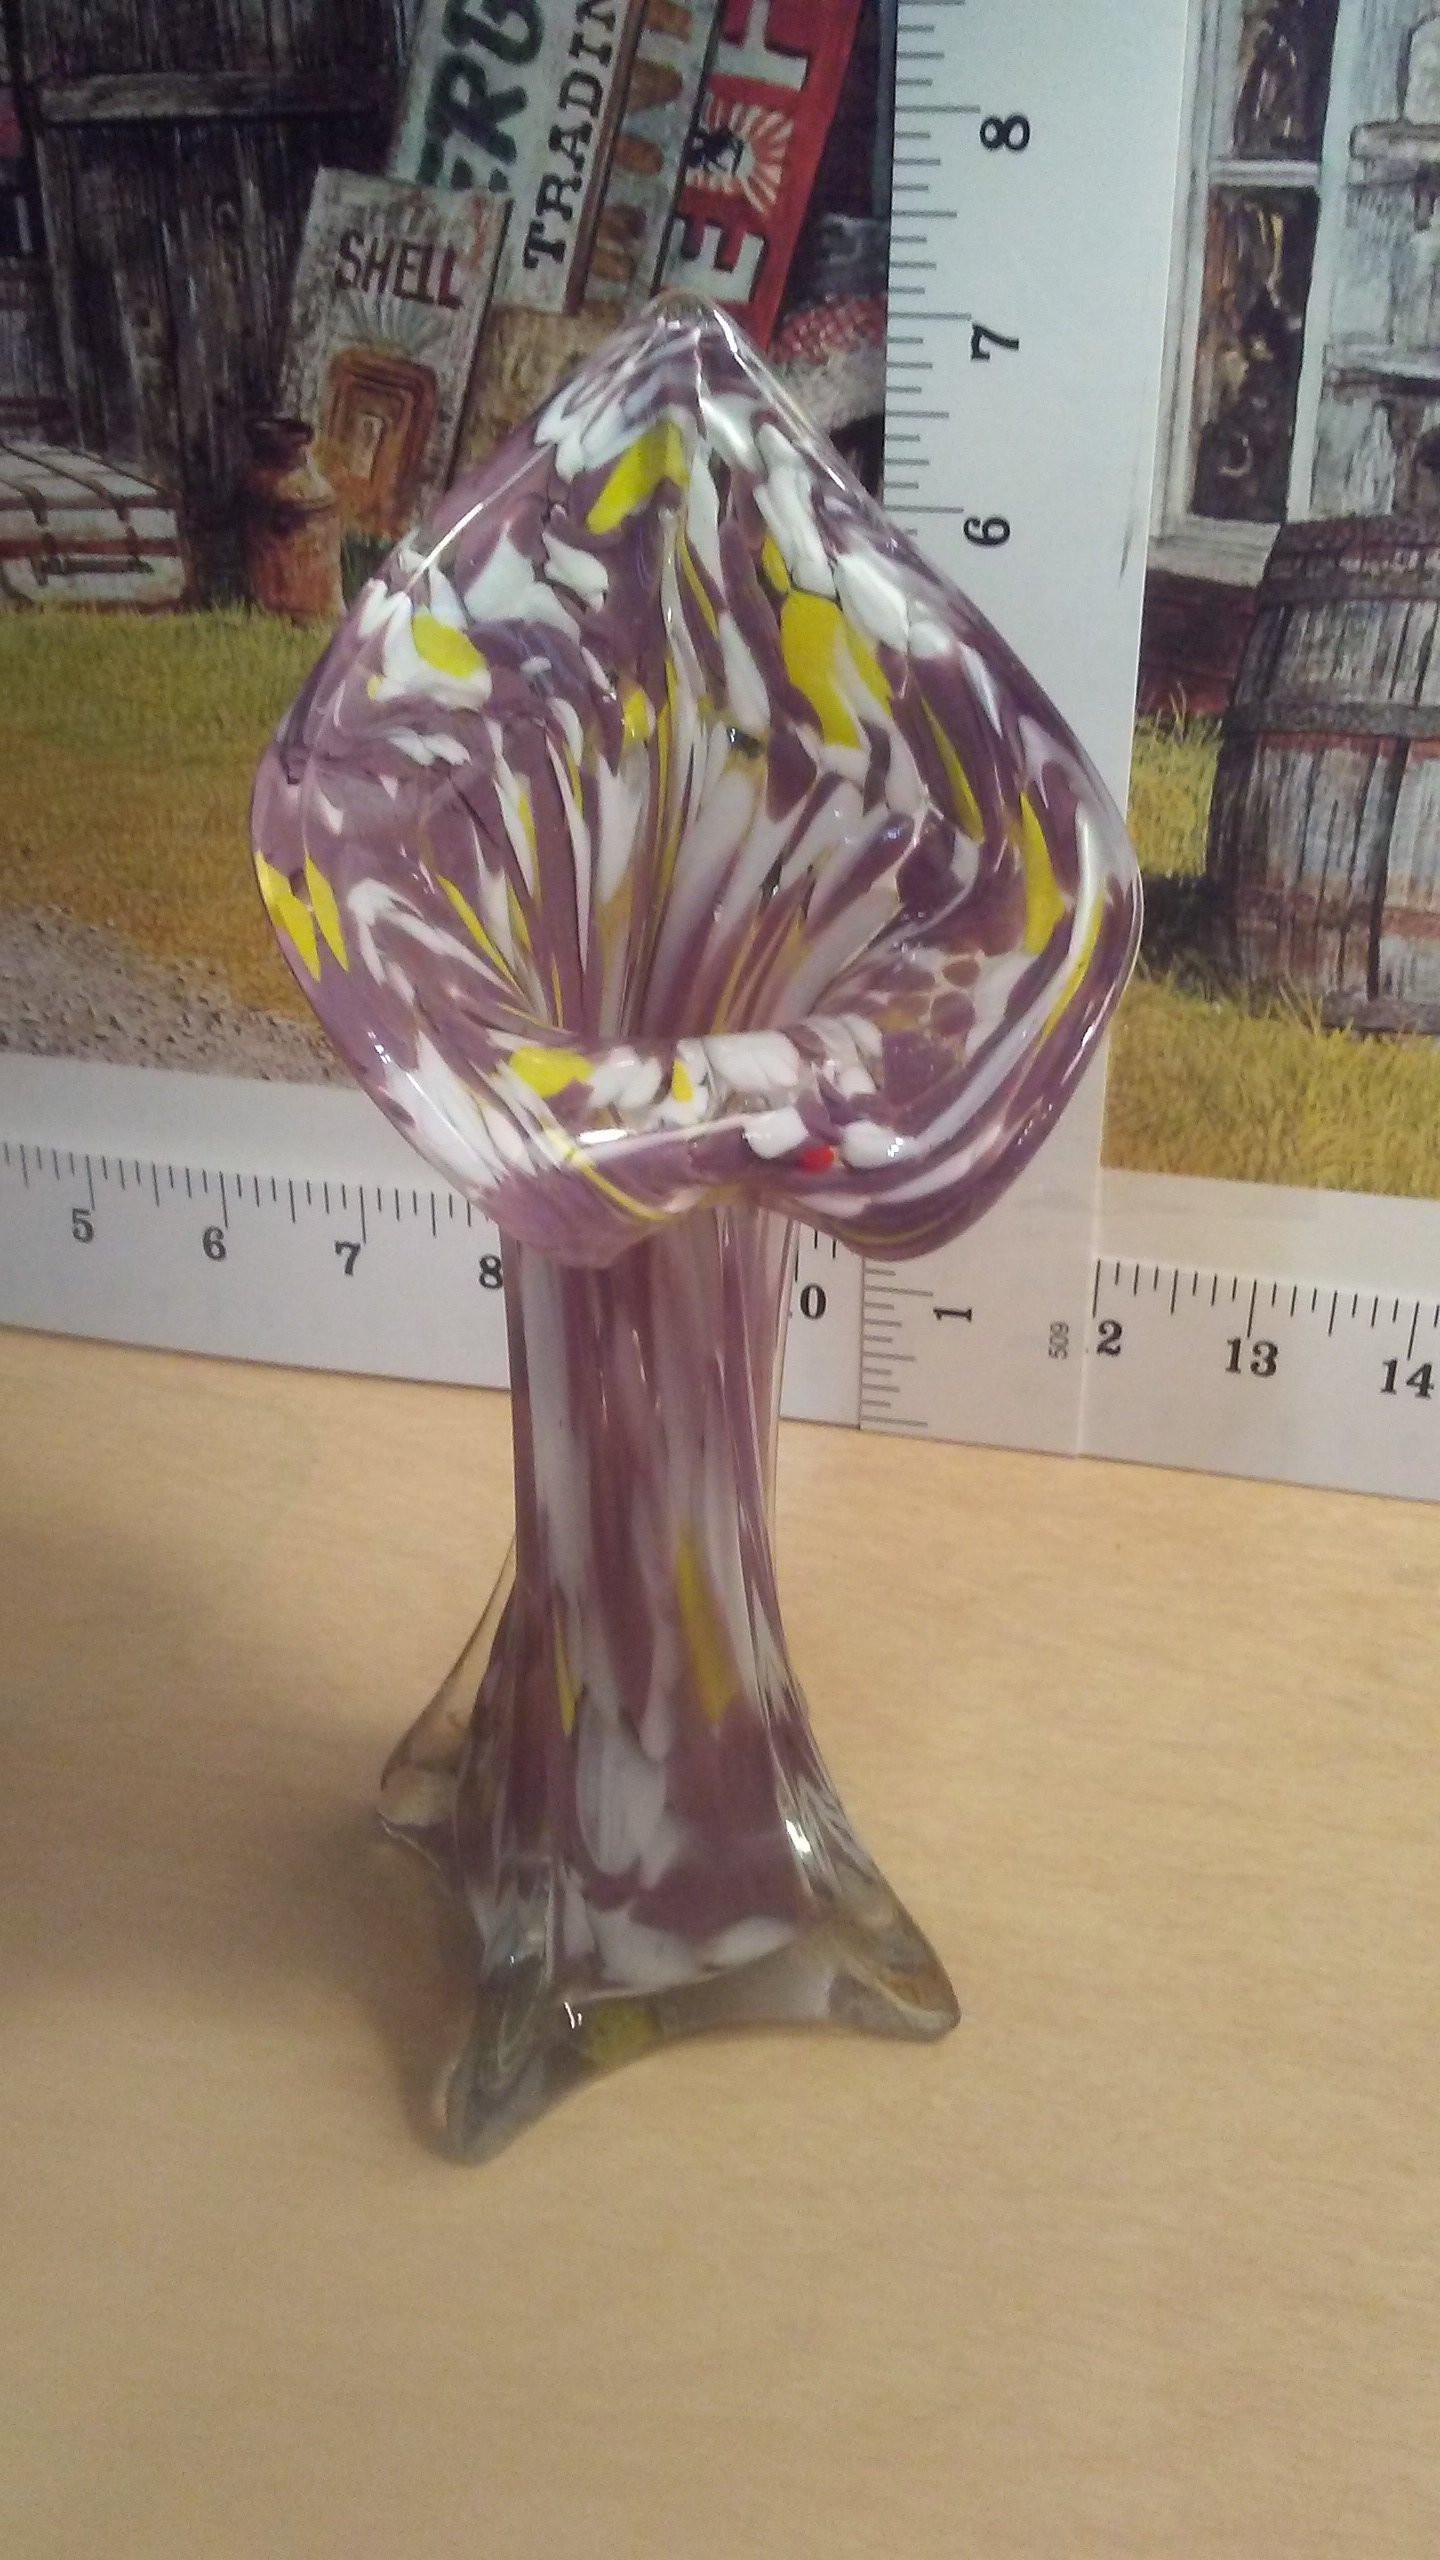 20 Wonderful Fenton Cranberry Glass Vase 2021 free download fenton cranberry glass vase of hand blown multi color jack in the pulpit 8 vase regarding dc29fc294c28ezoom